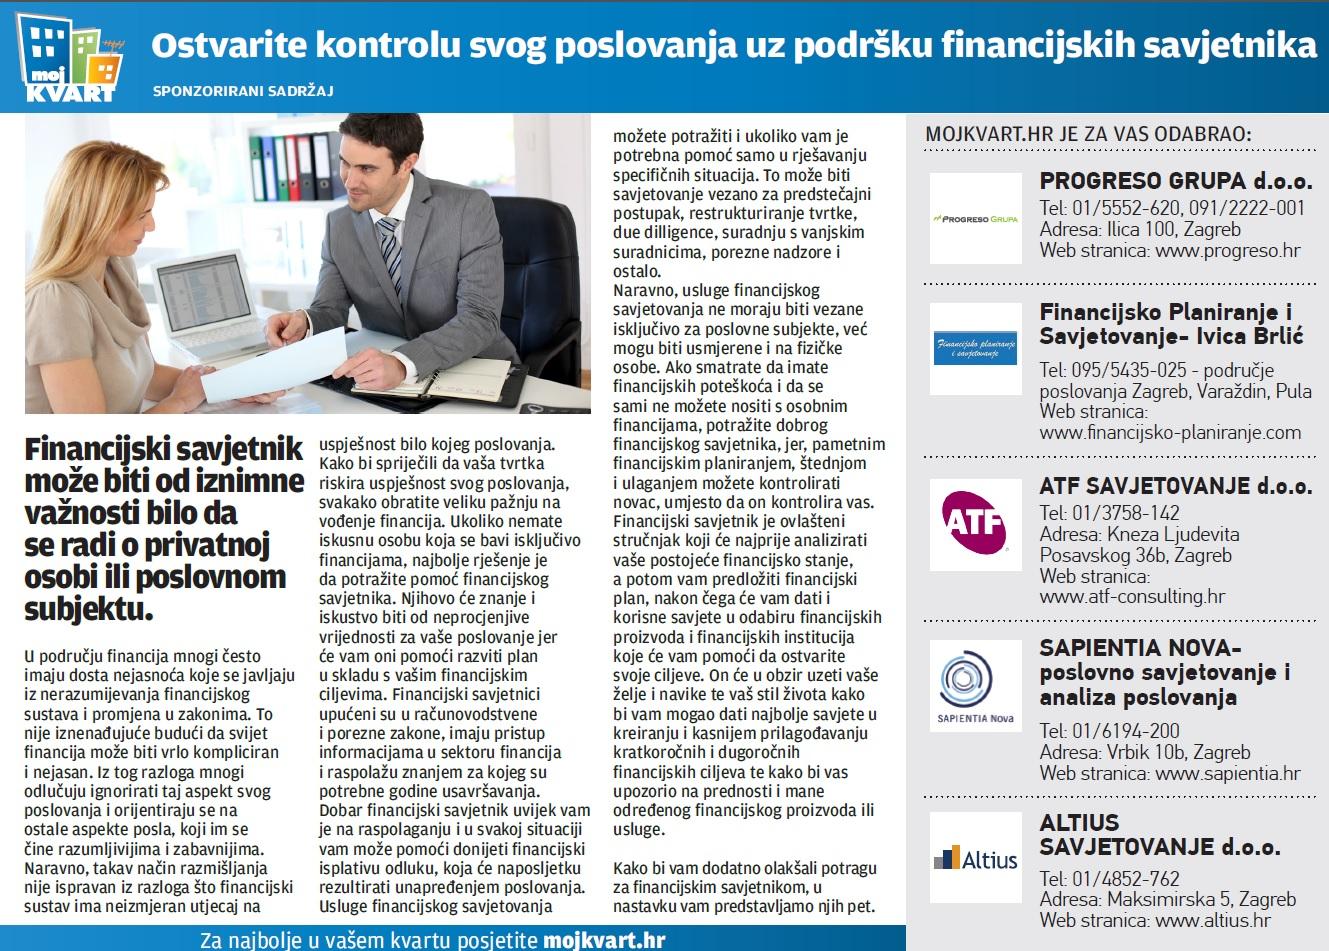 Članak u Večernjem listu – Ivica Brlić